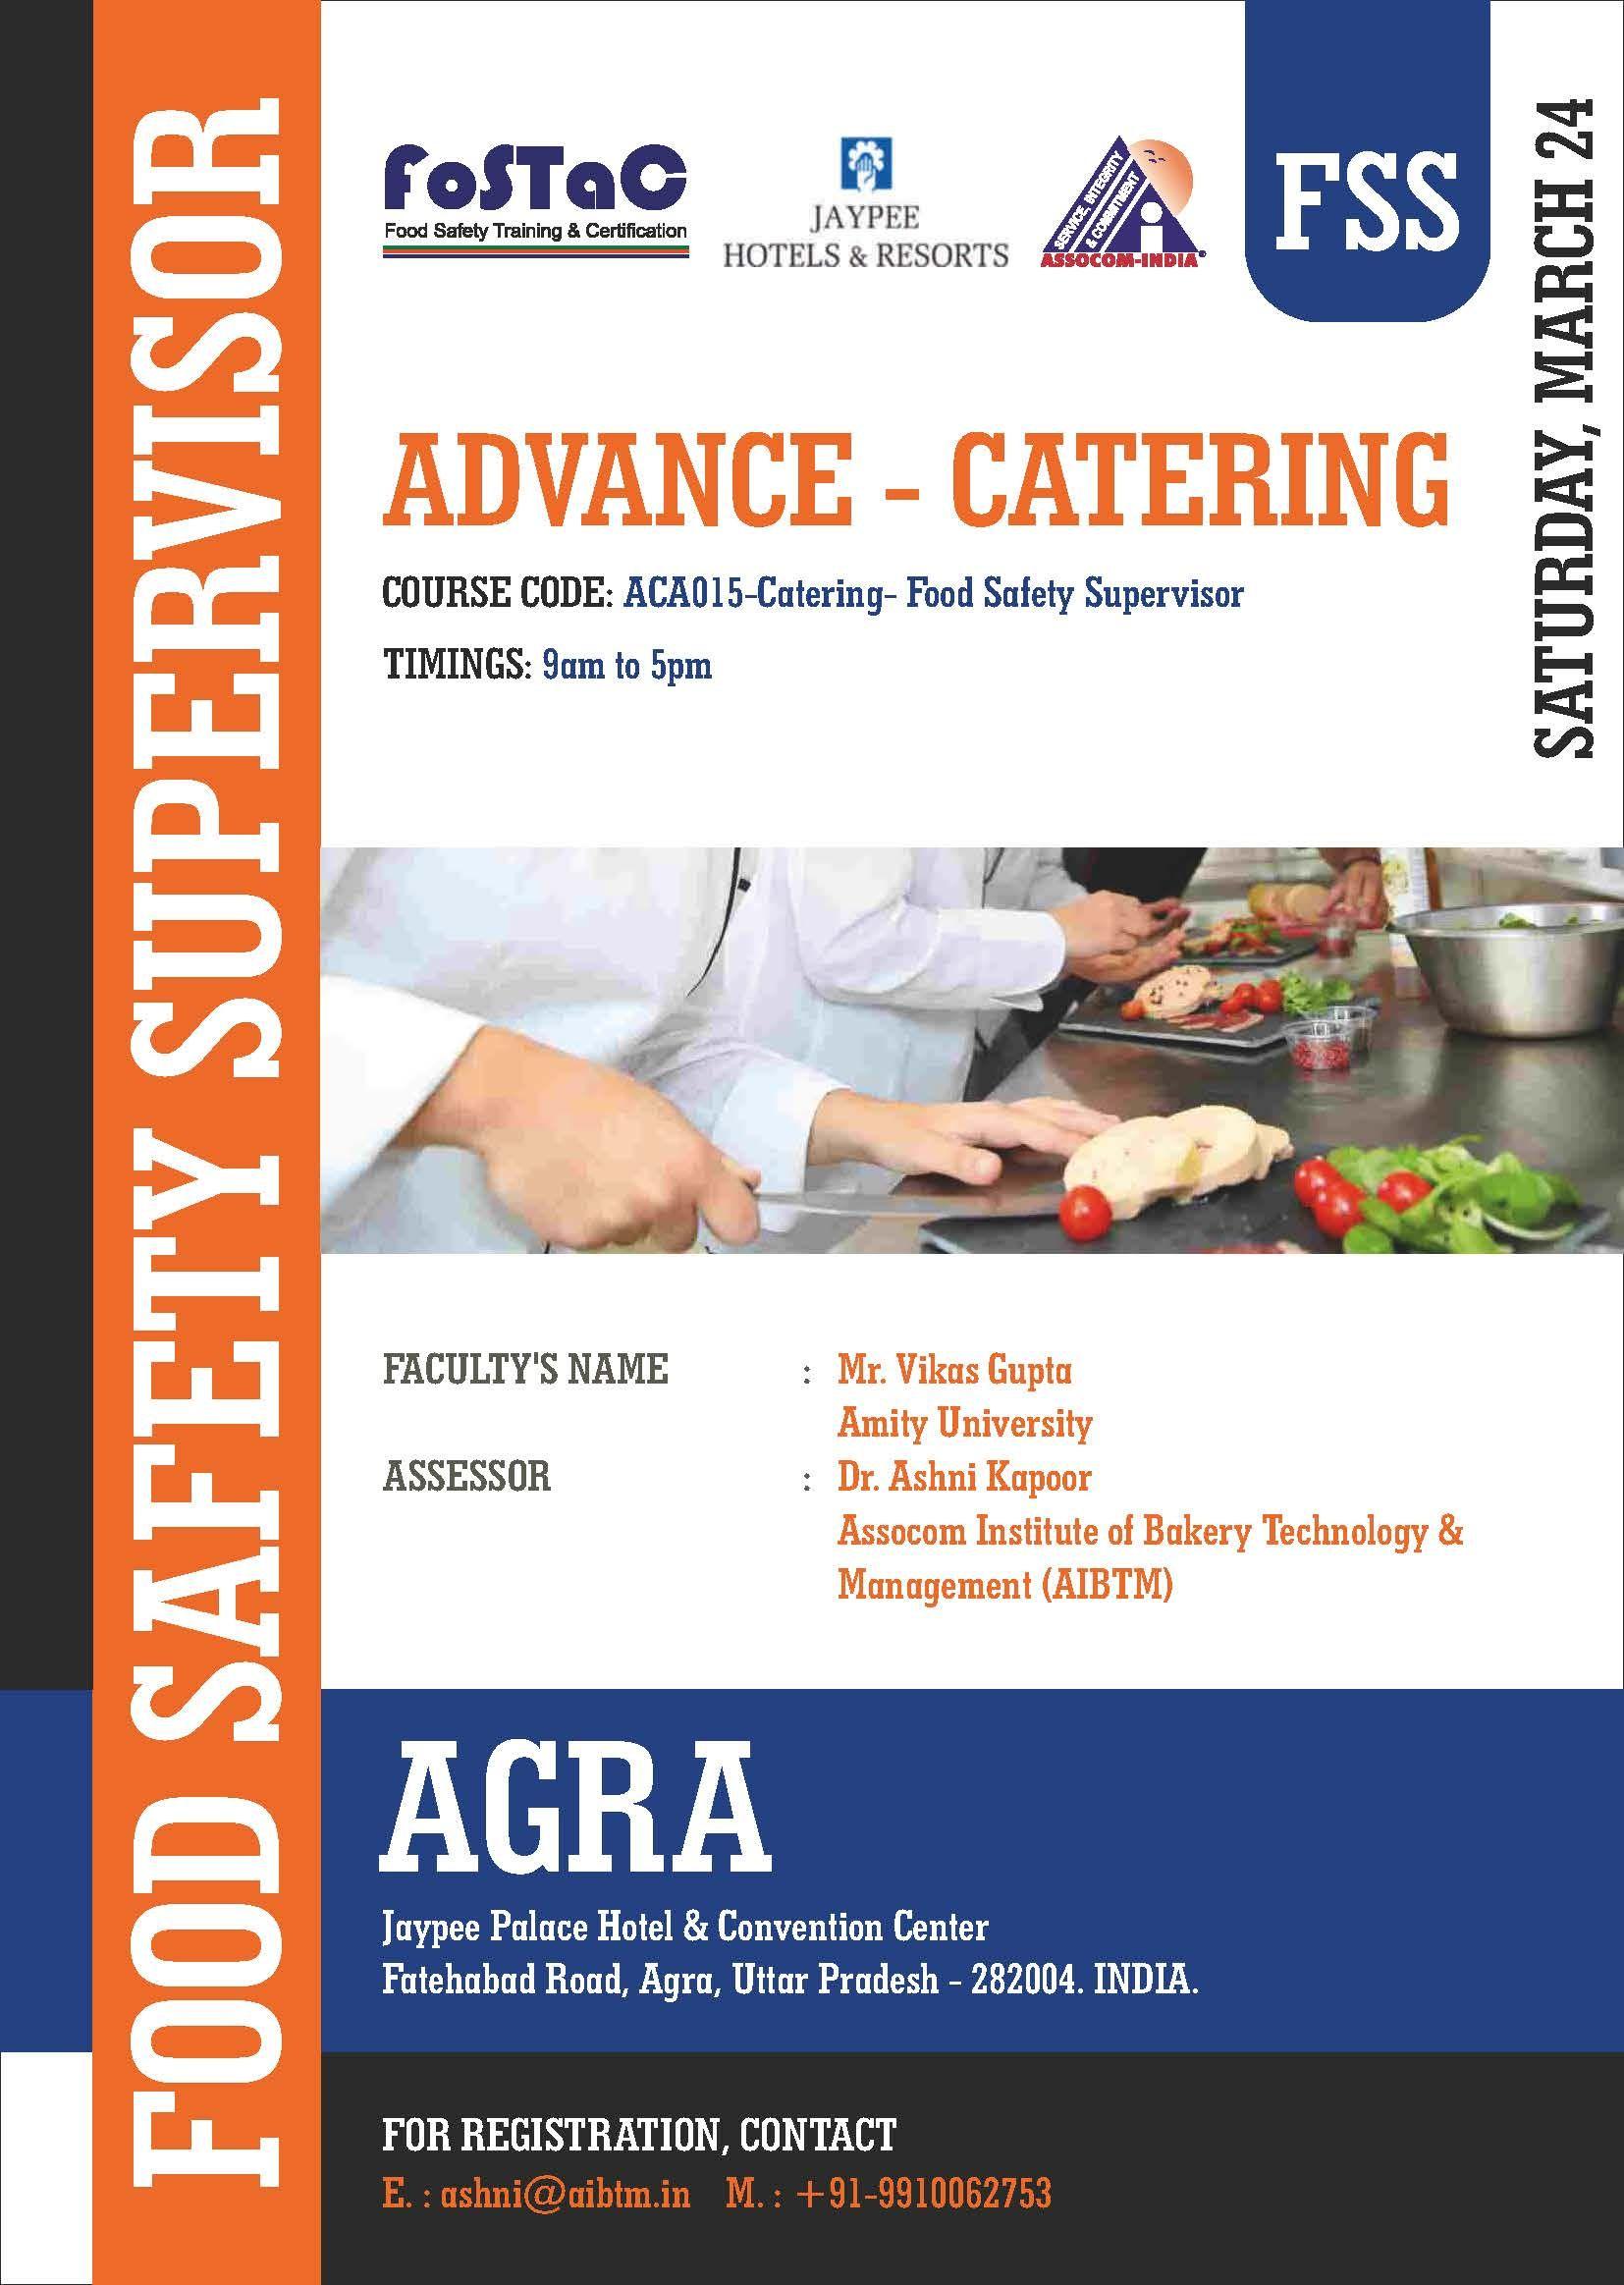 FoodSafetySupervisor Training Program on ADVANCE